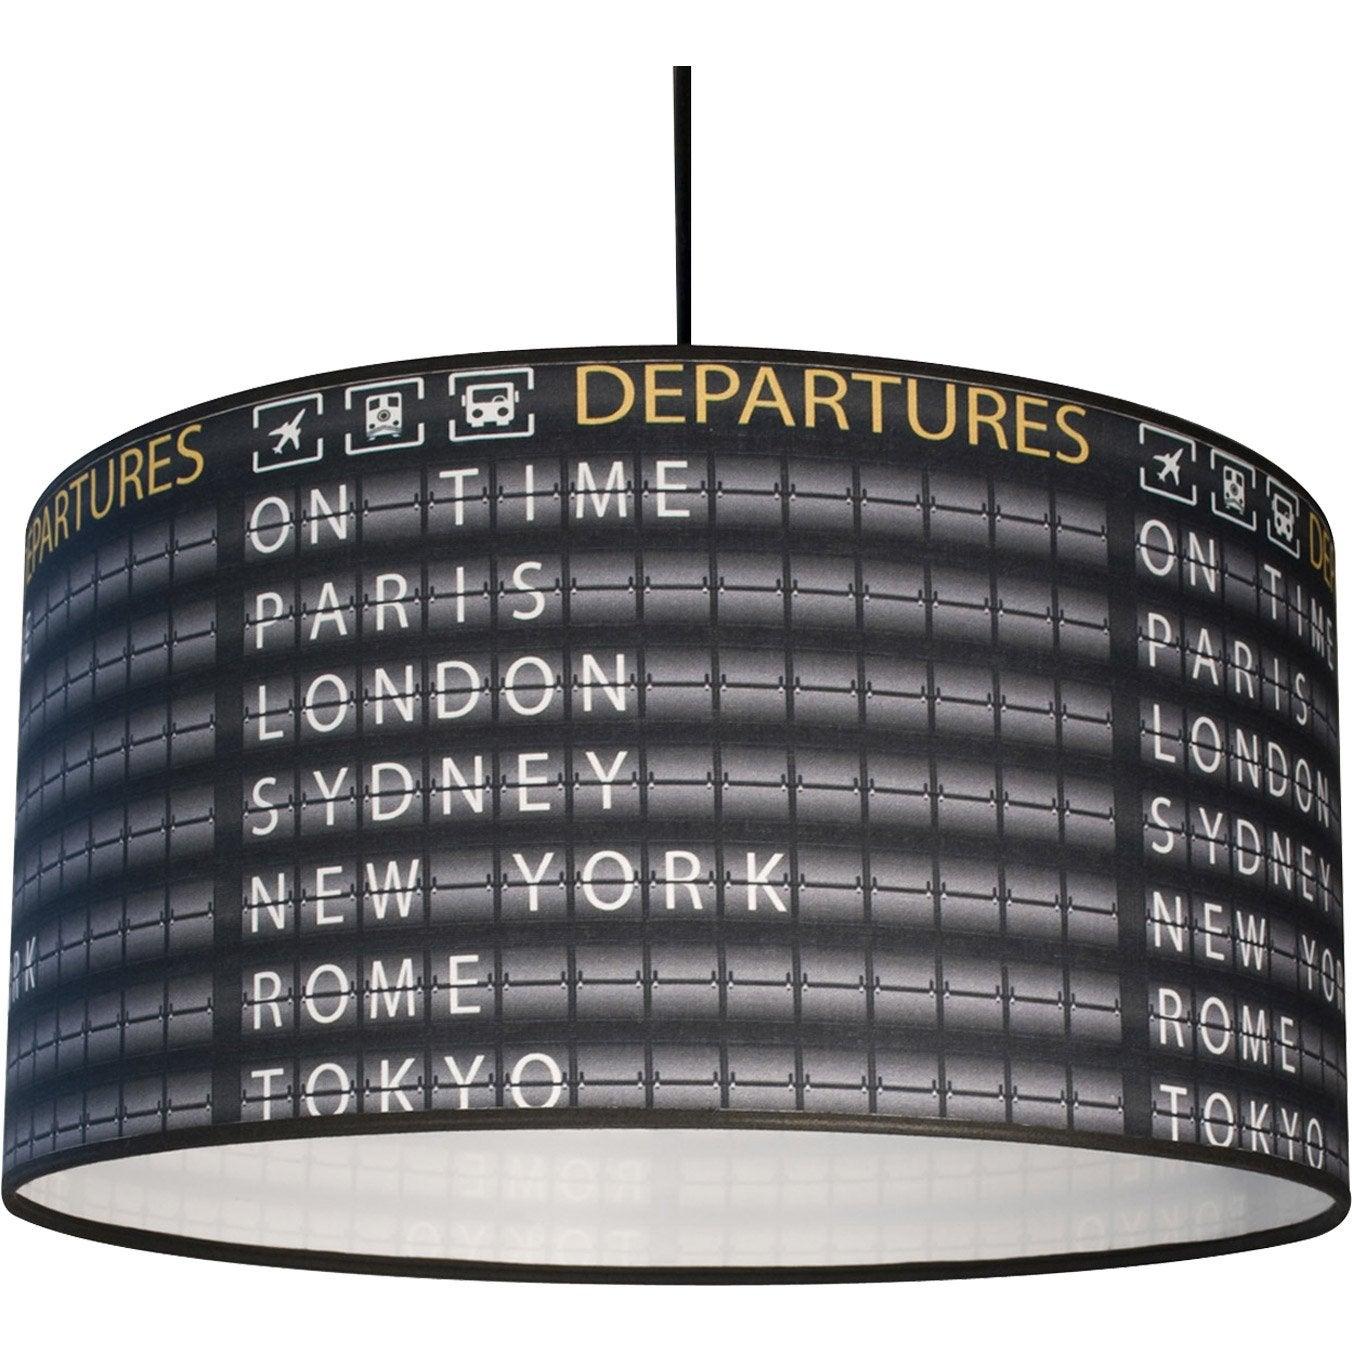 W X SuspensionE27 Departures 1 Tissus City Noir Metropolight 60 W9YDH2EI